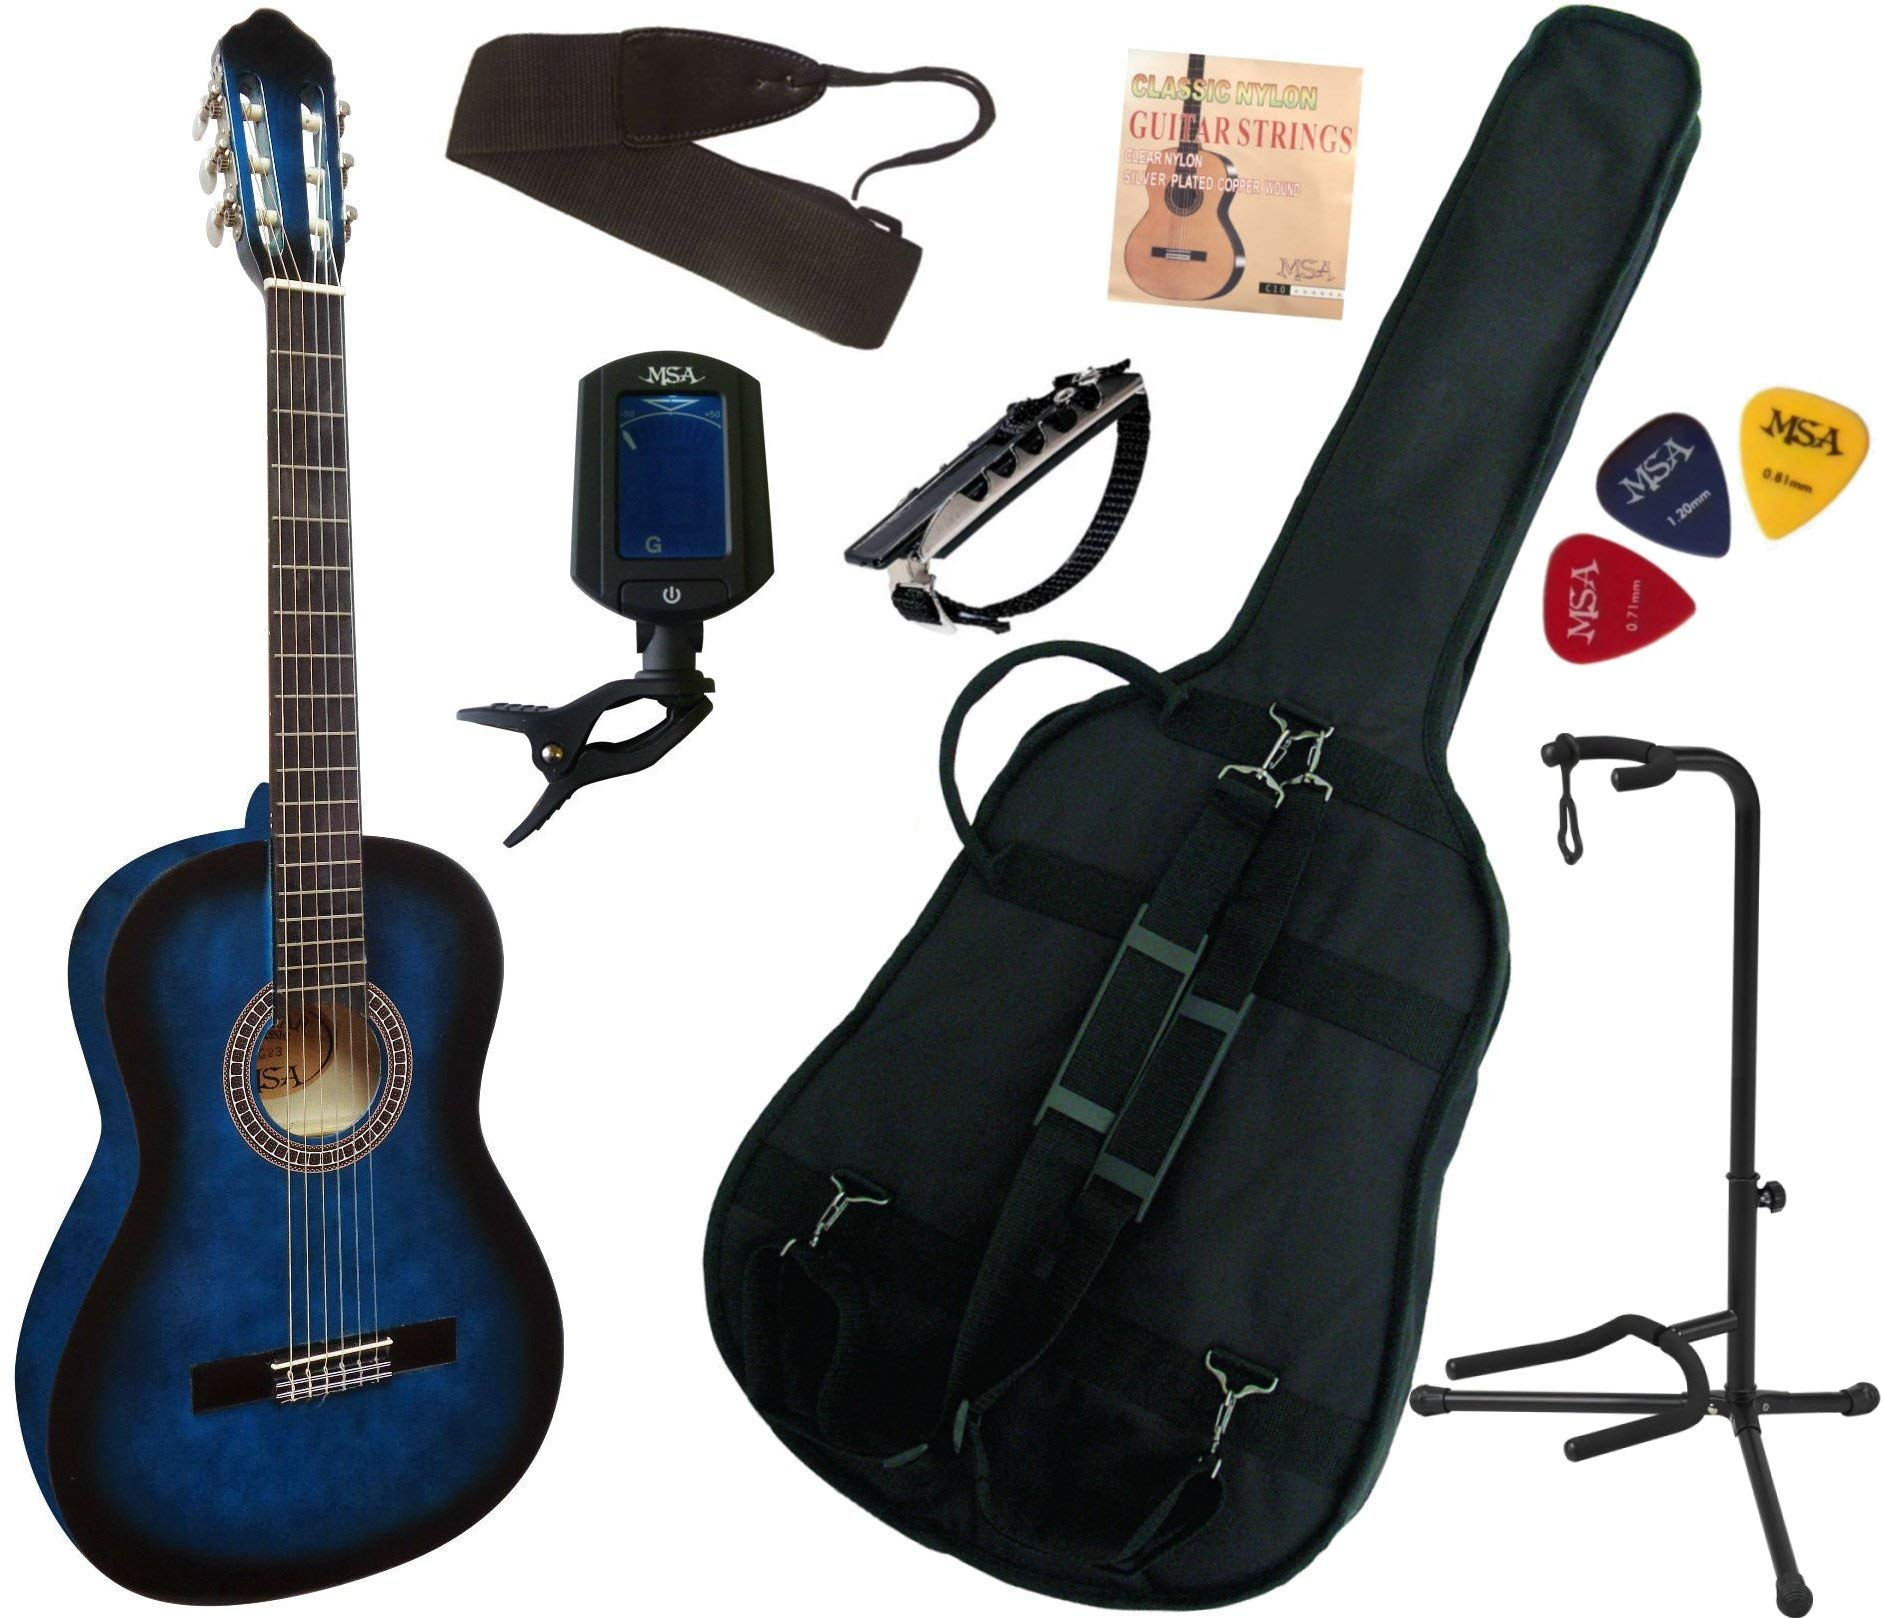 MSA - Lote de guitarra clásica 4/4 para adulto, con 7 accesorios ...